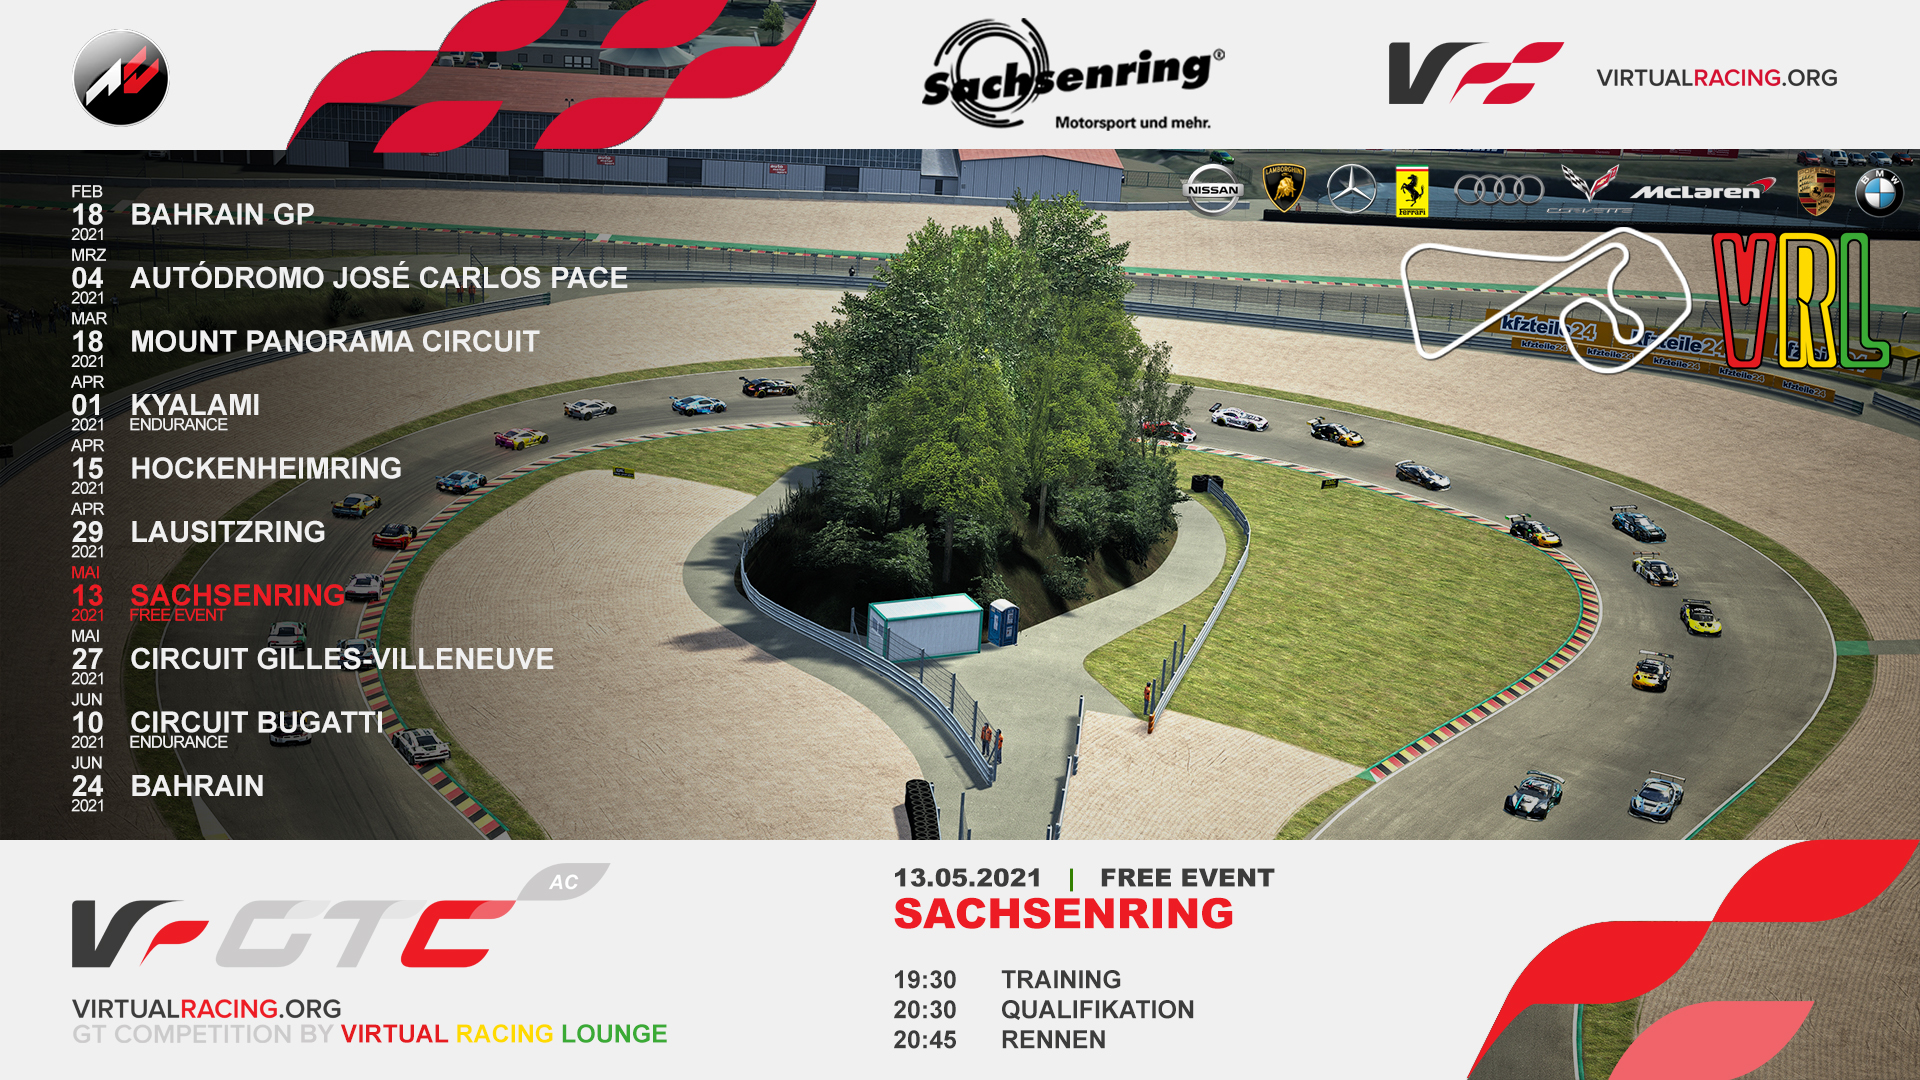 GTC12_FreeEvent_Sachsenring.jpg